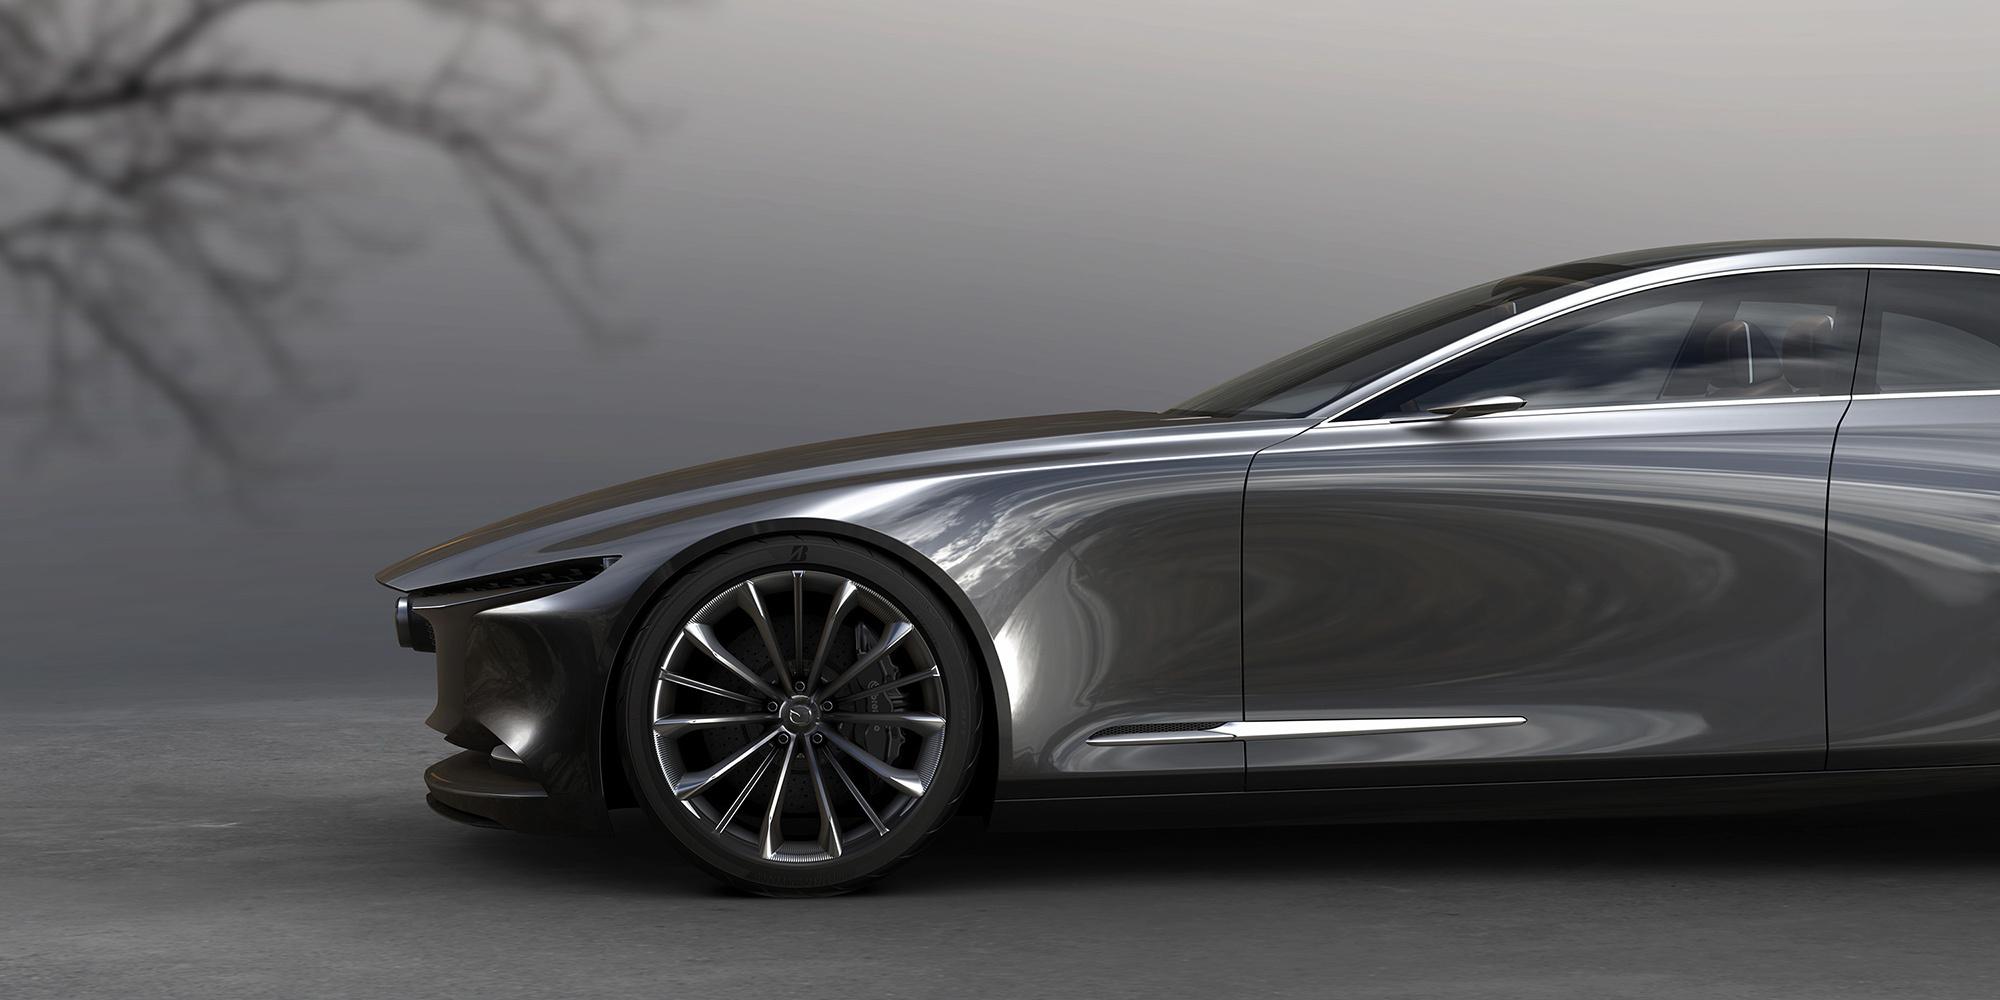 Mazda Vision Coupe Widescreen